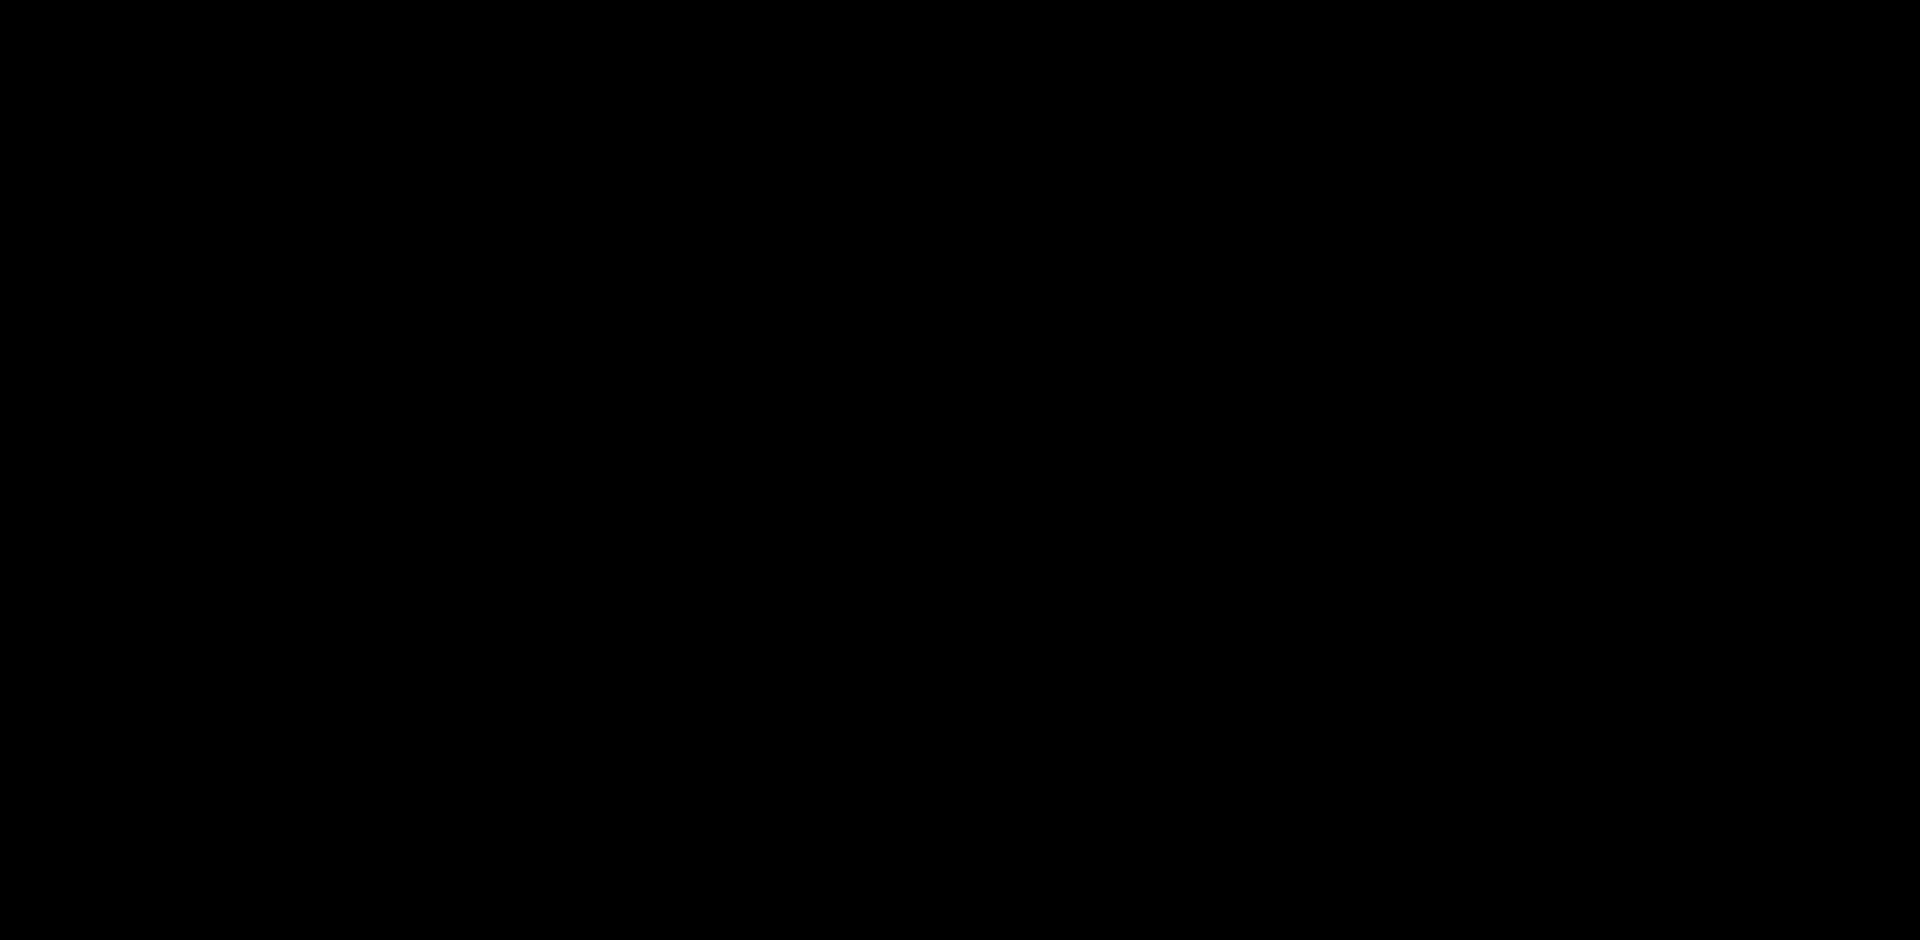 BLANCOS_25x75_Amb01_WEB.jpg